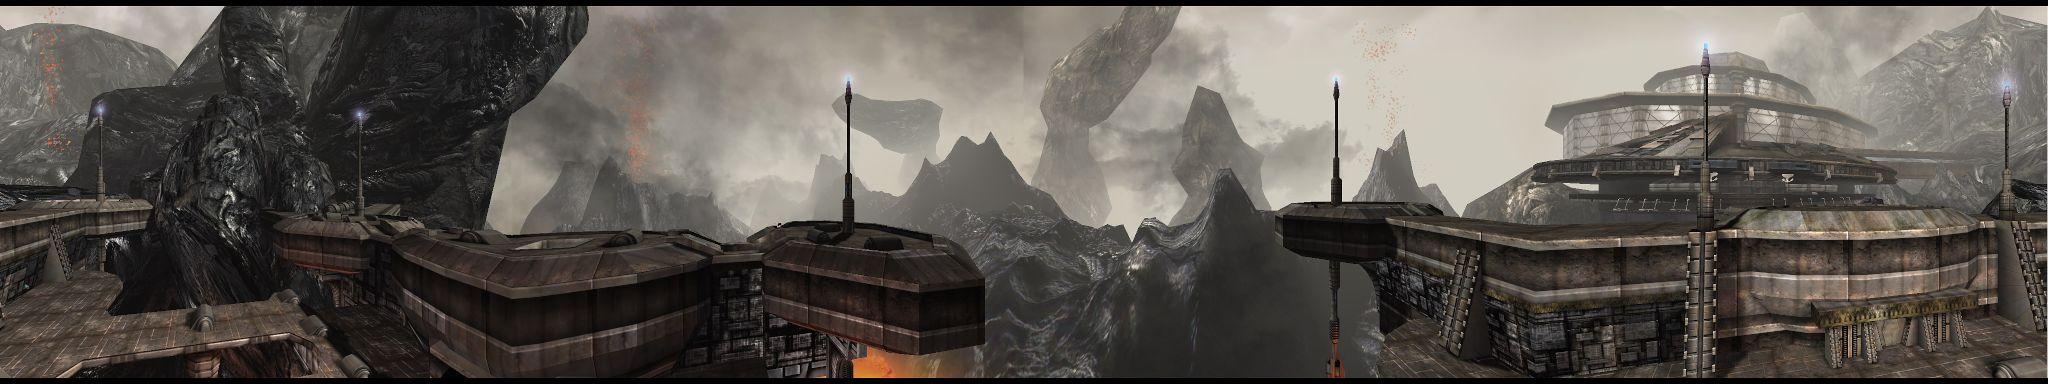 Games: Stargate SG-1: The Alliance - 007